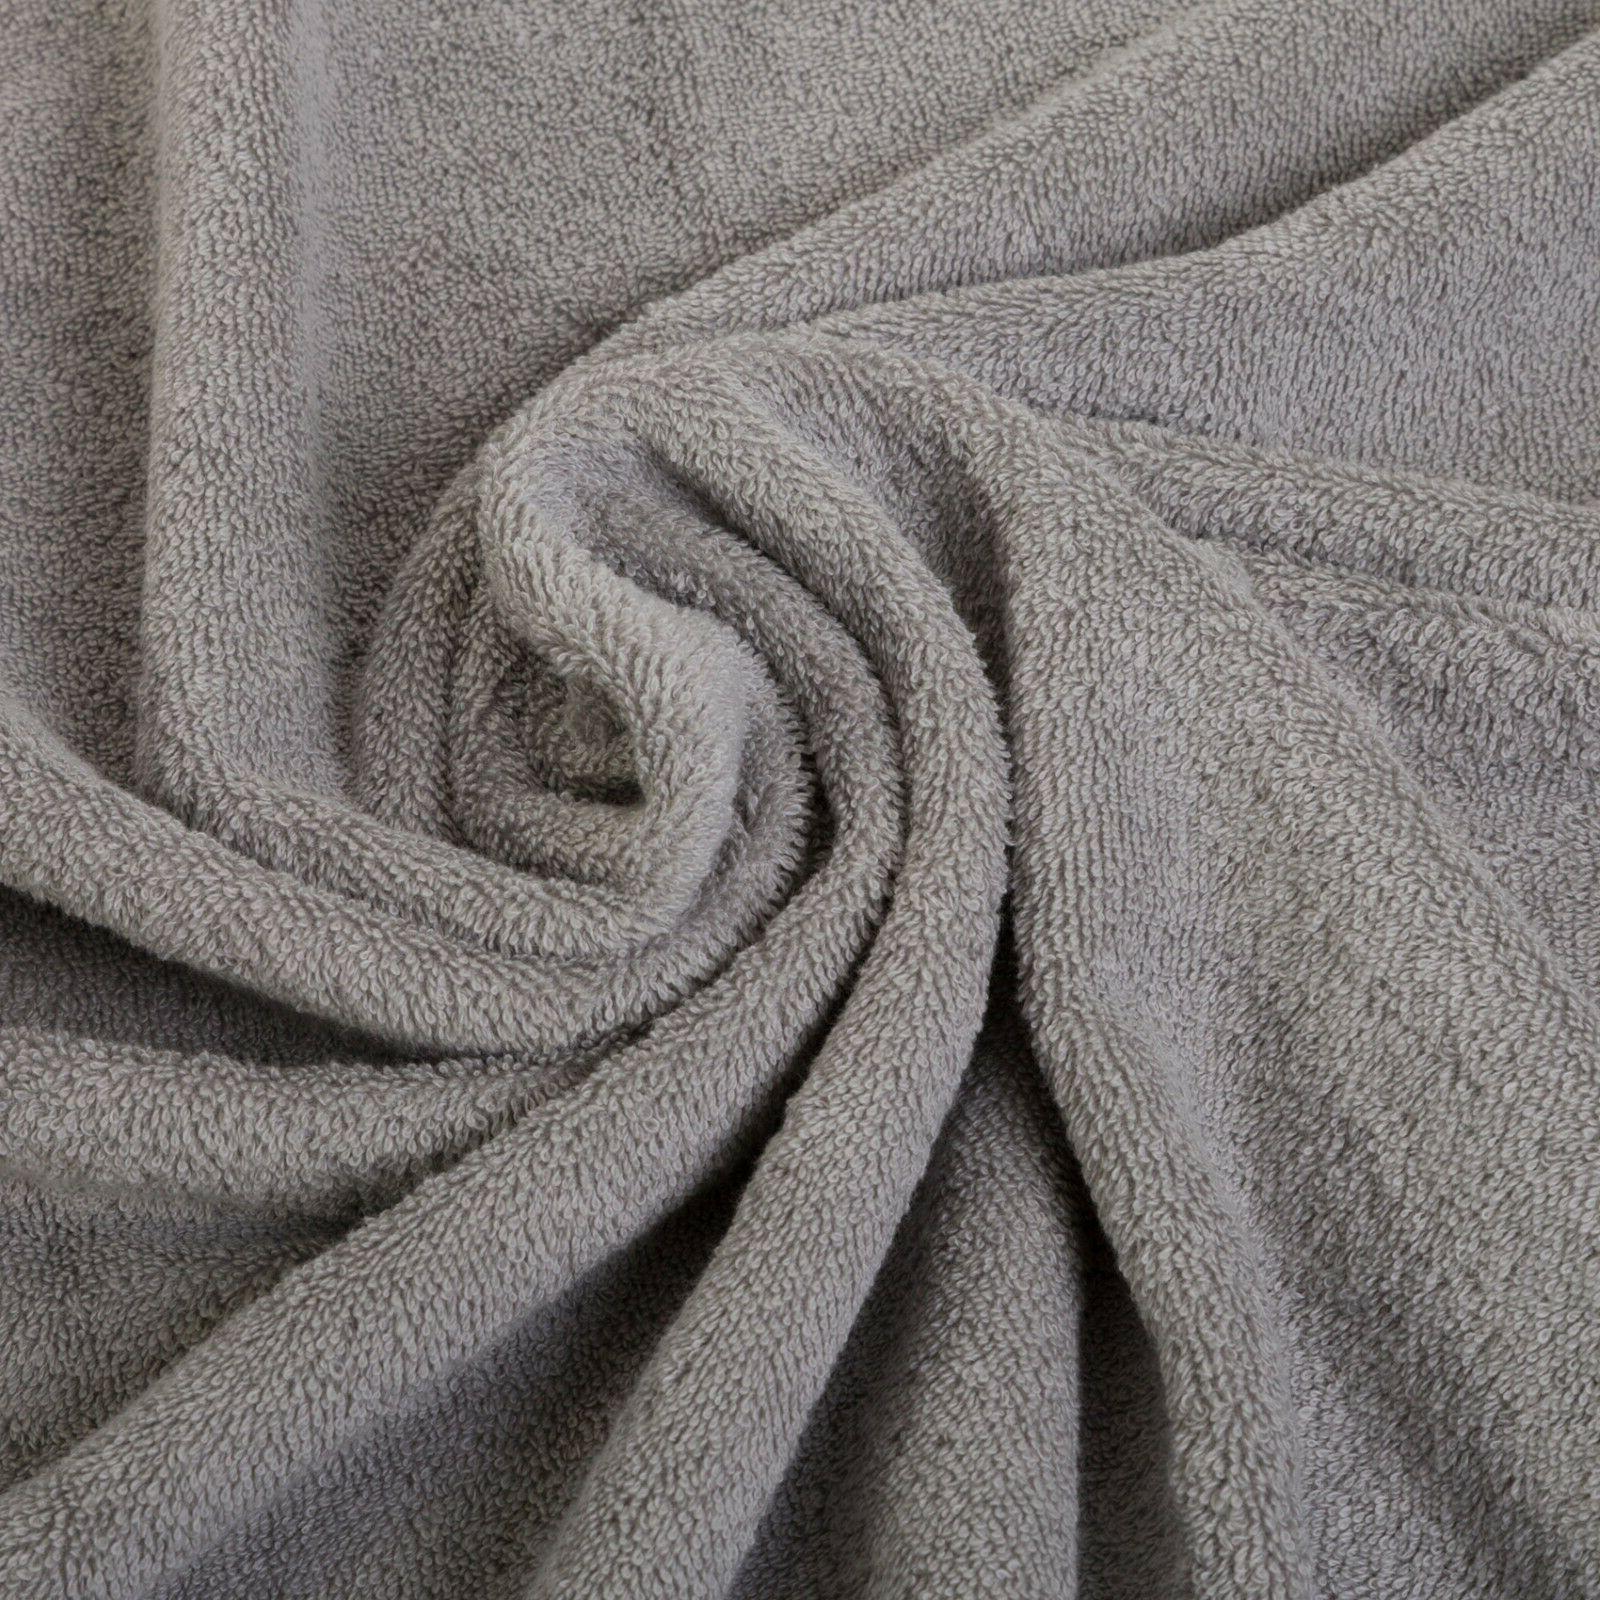 NEW GRAY ULTRA SUPER LUXURY PURE TURKISH BATH TOWELS